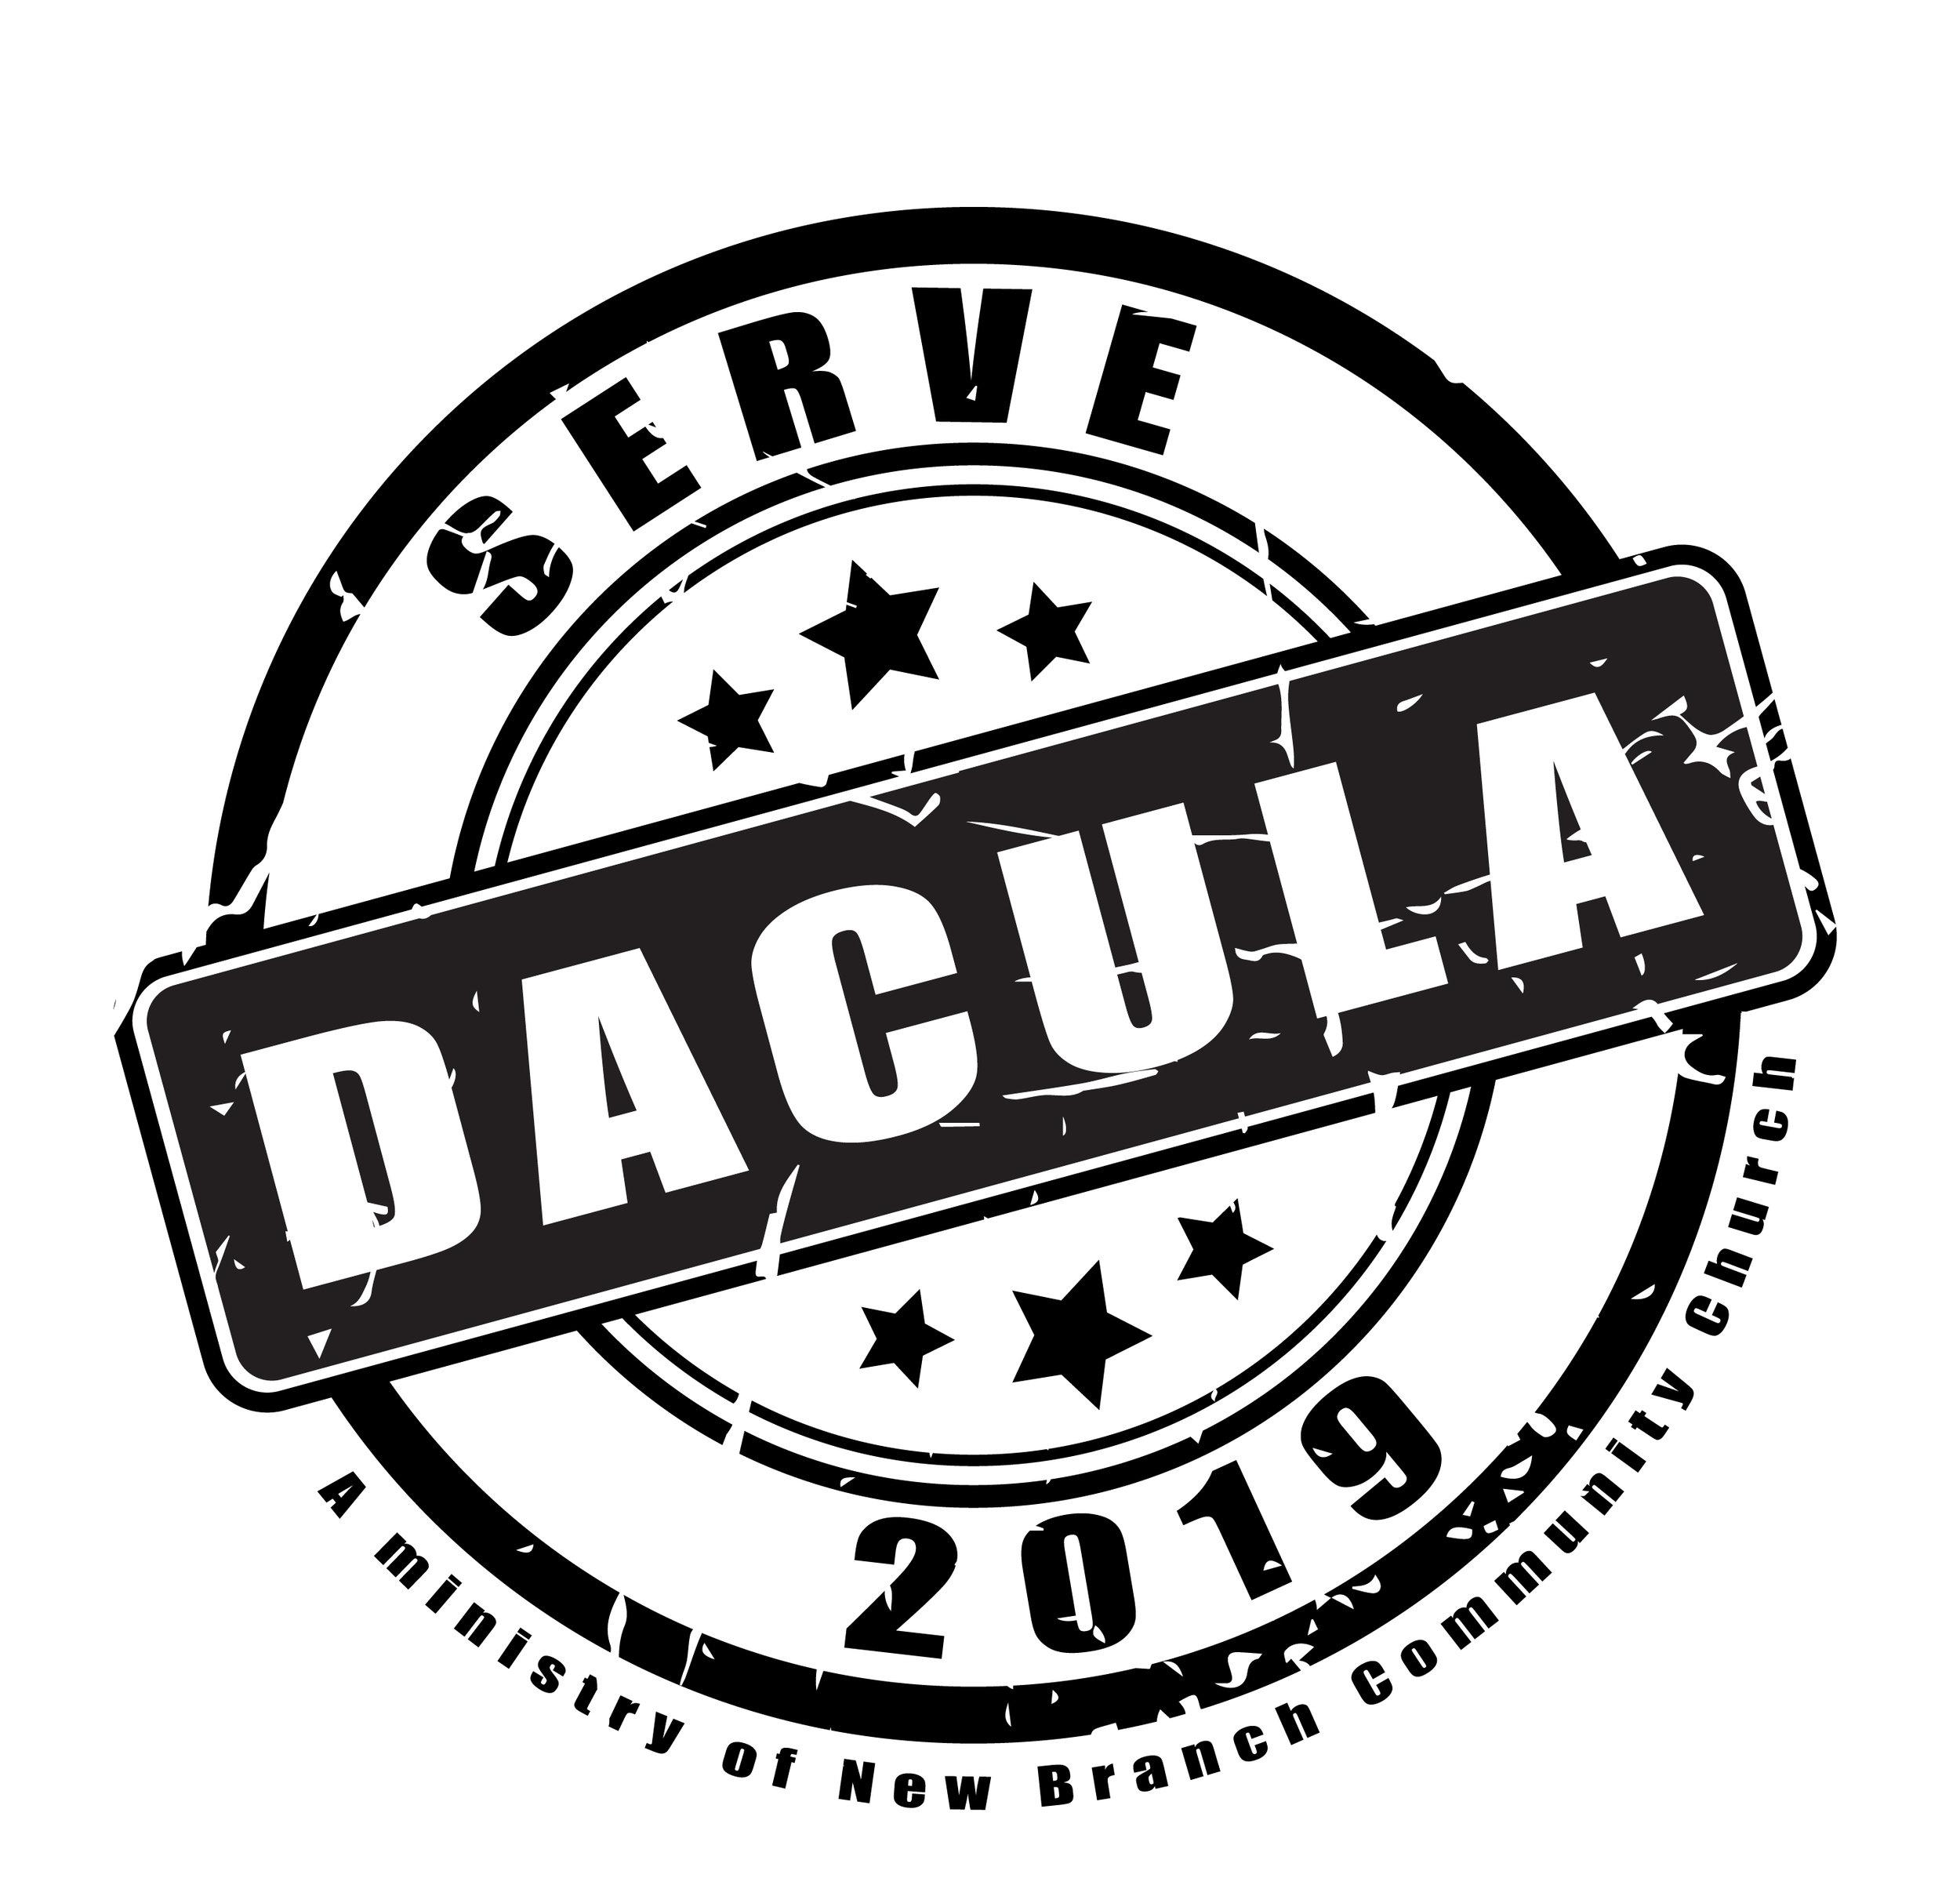 serve dacula2019.jpg